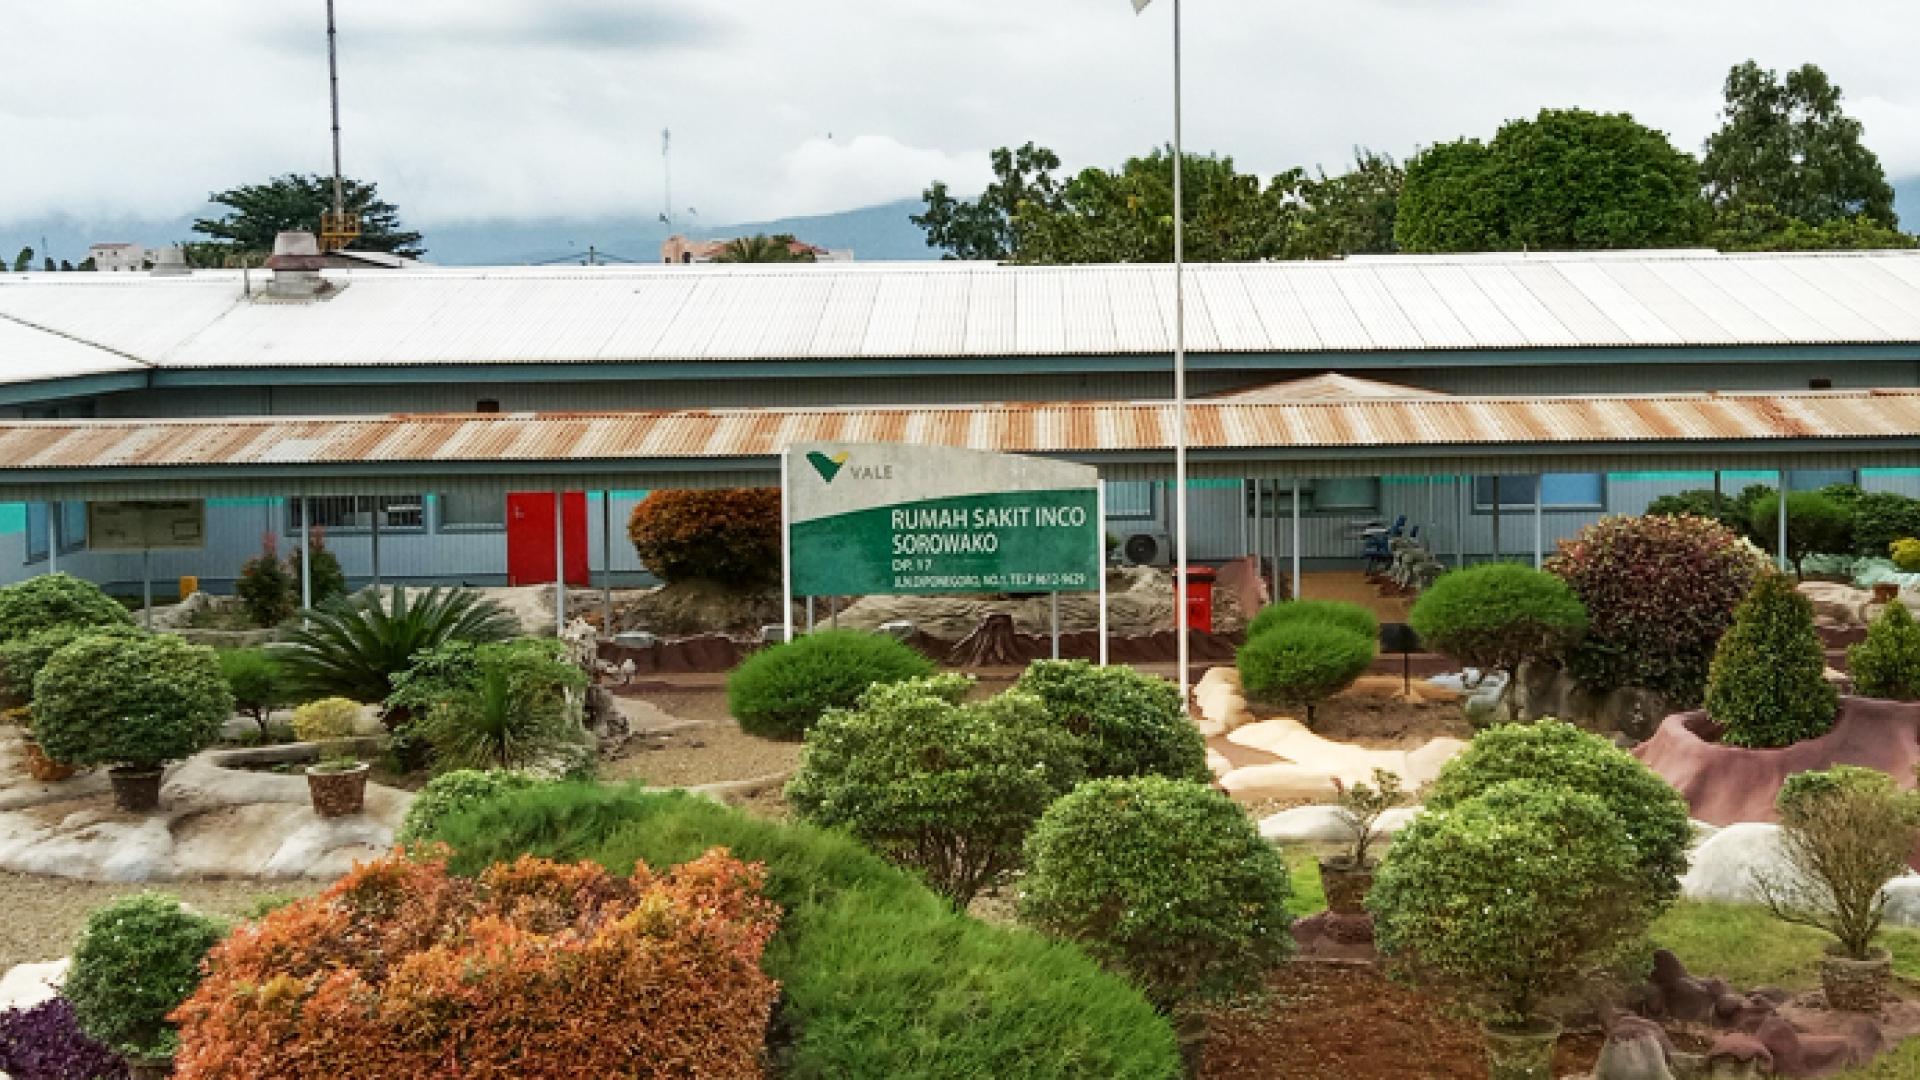 Primaya Hospital Inco Sorowako